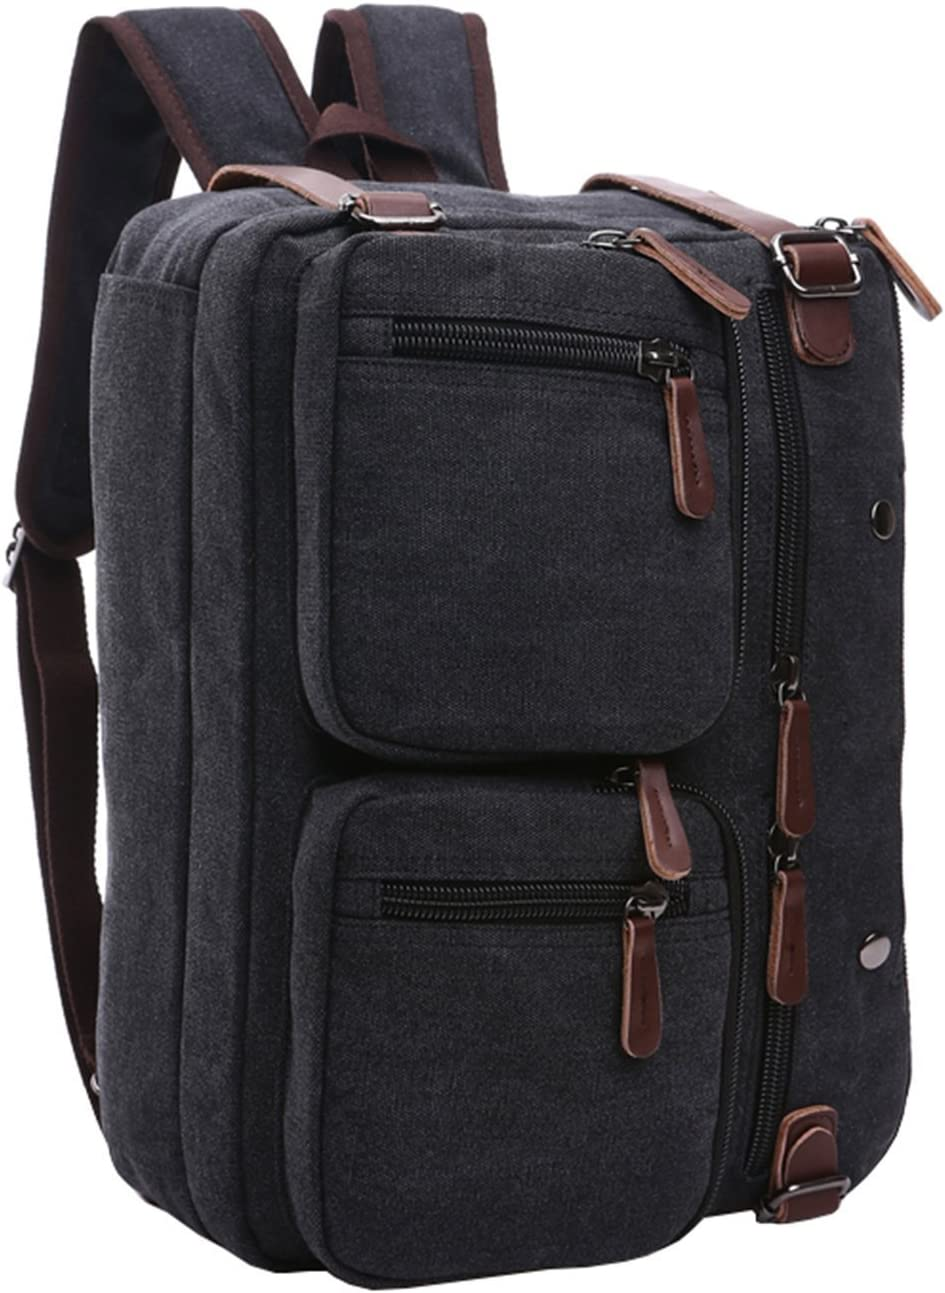 3-Way Convertible Briefcase Laptop Backpack Messenger Bag Backpack for Man Women (BLACK)